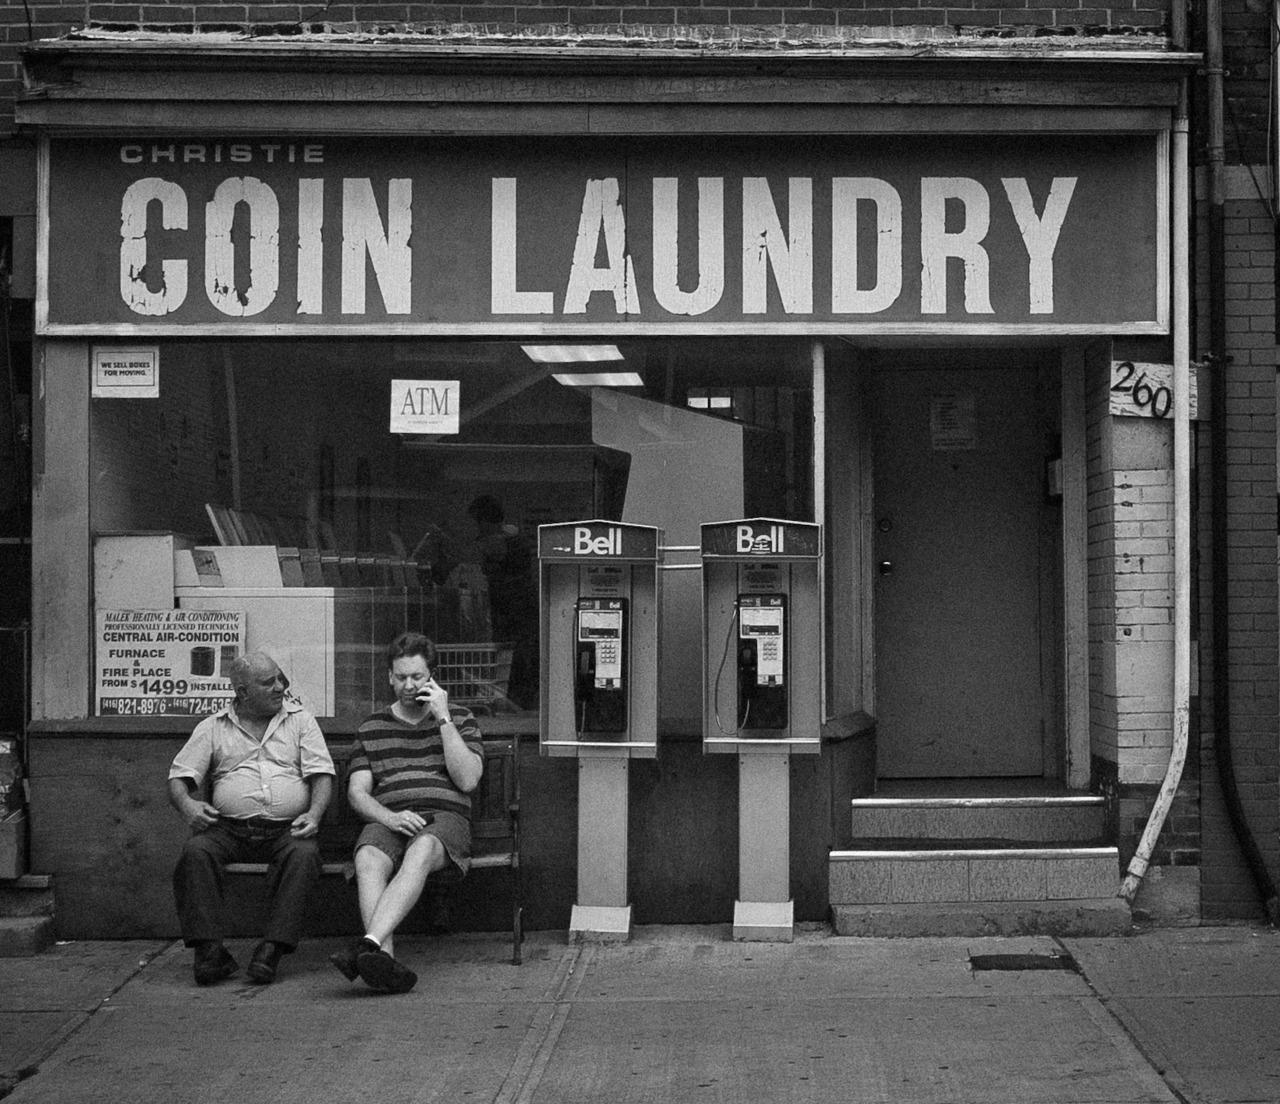 Christie Coin Laundry. Toronto.